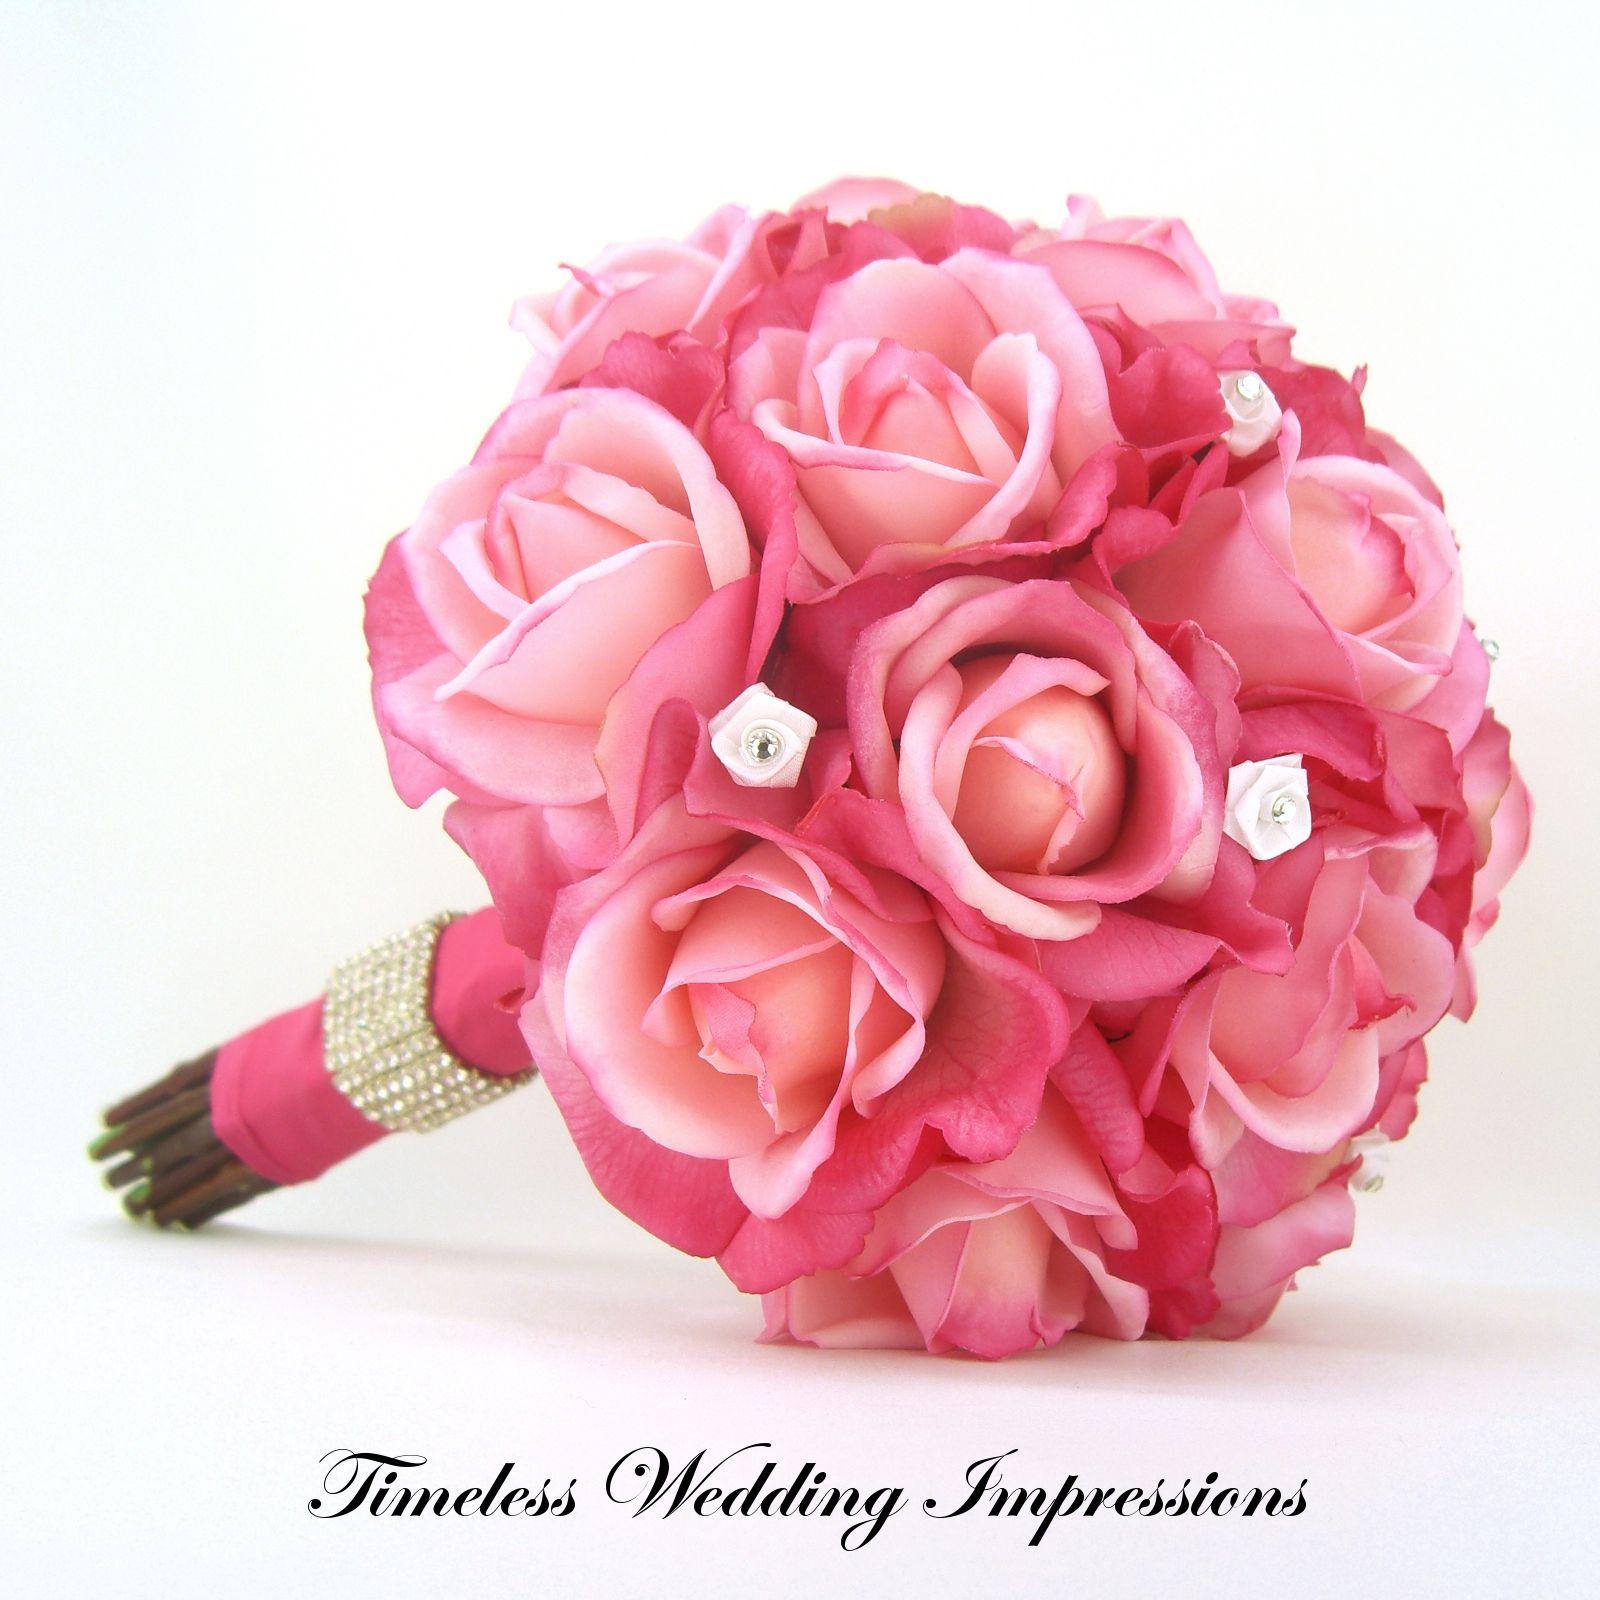 Swarovski Crystal Bridal Bouquet Rose Bridal Bouquet Swarovski